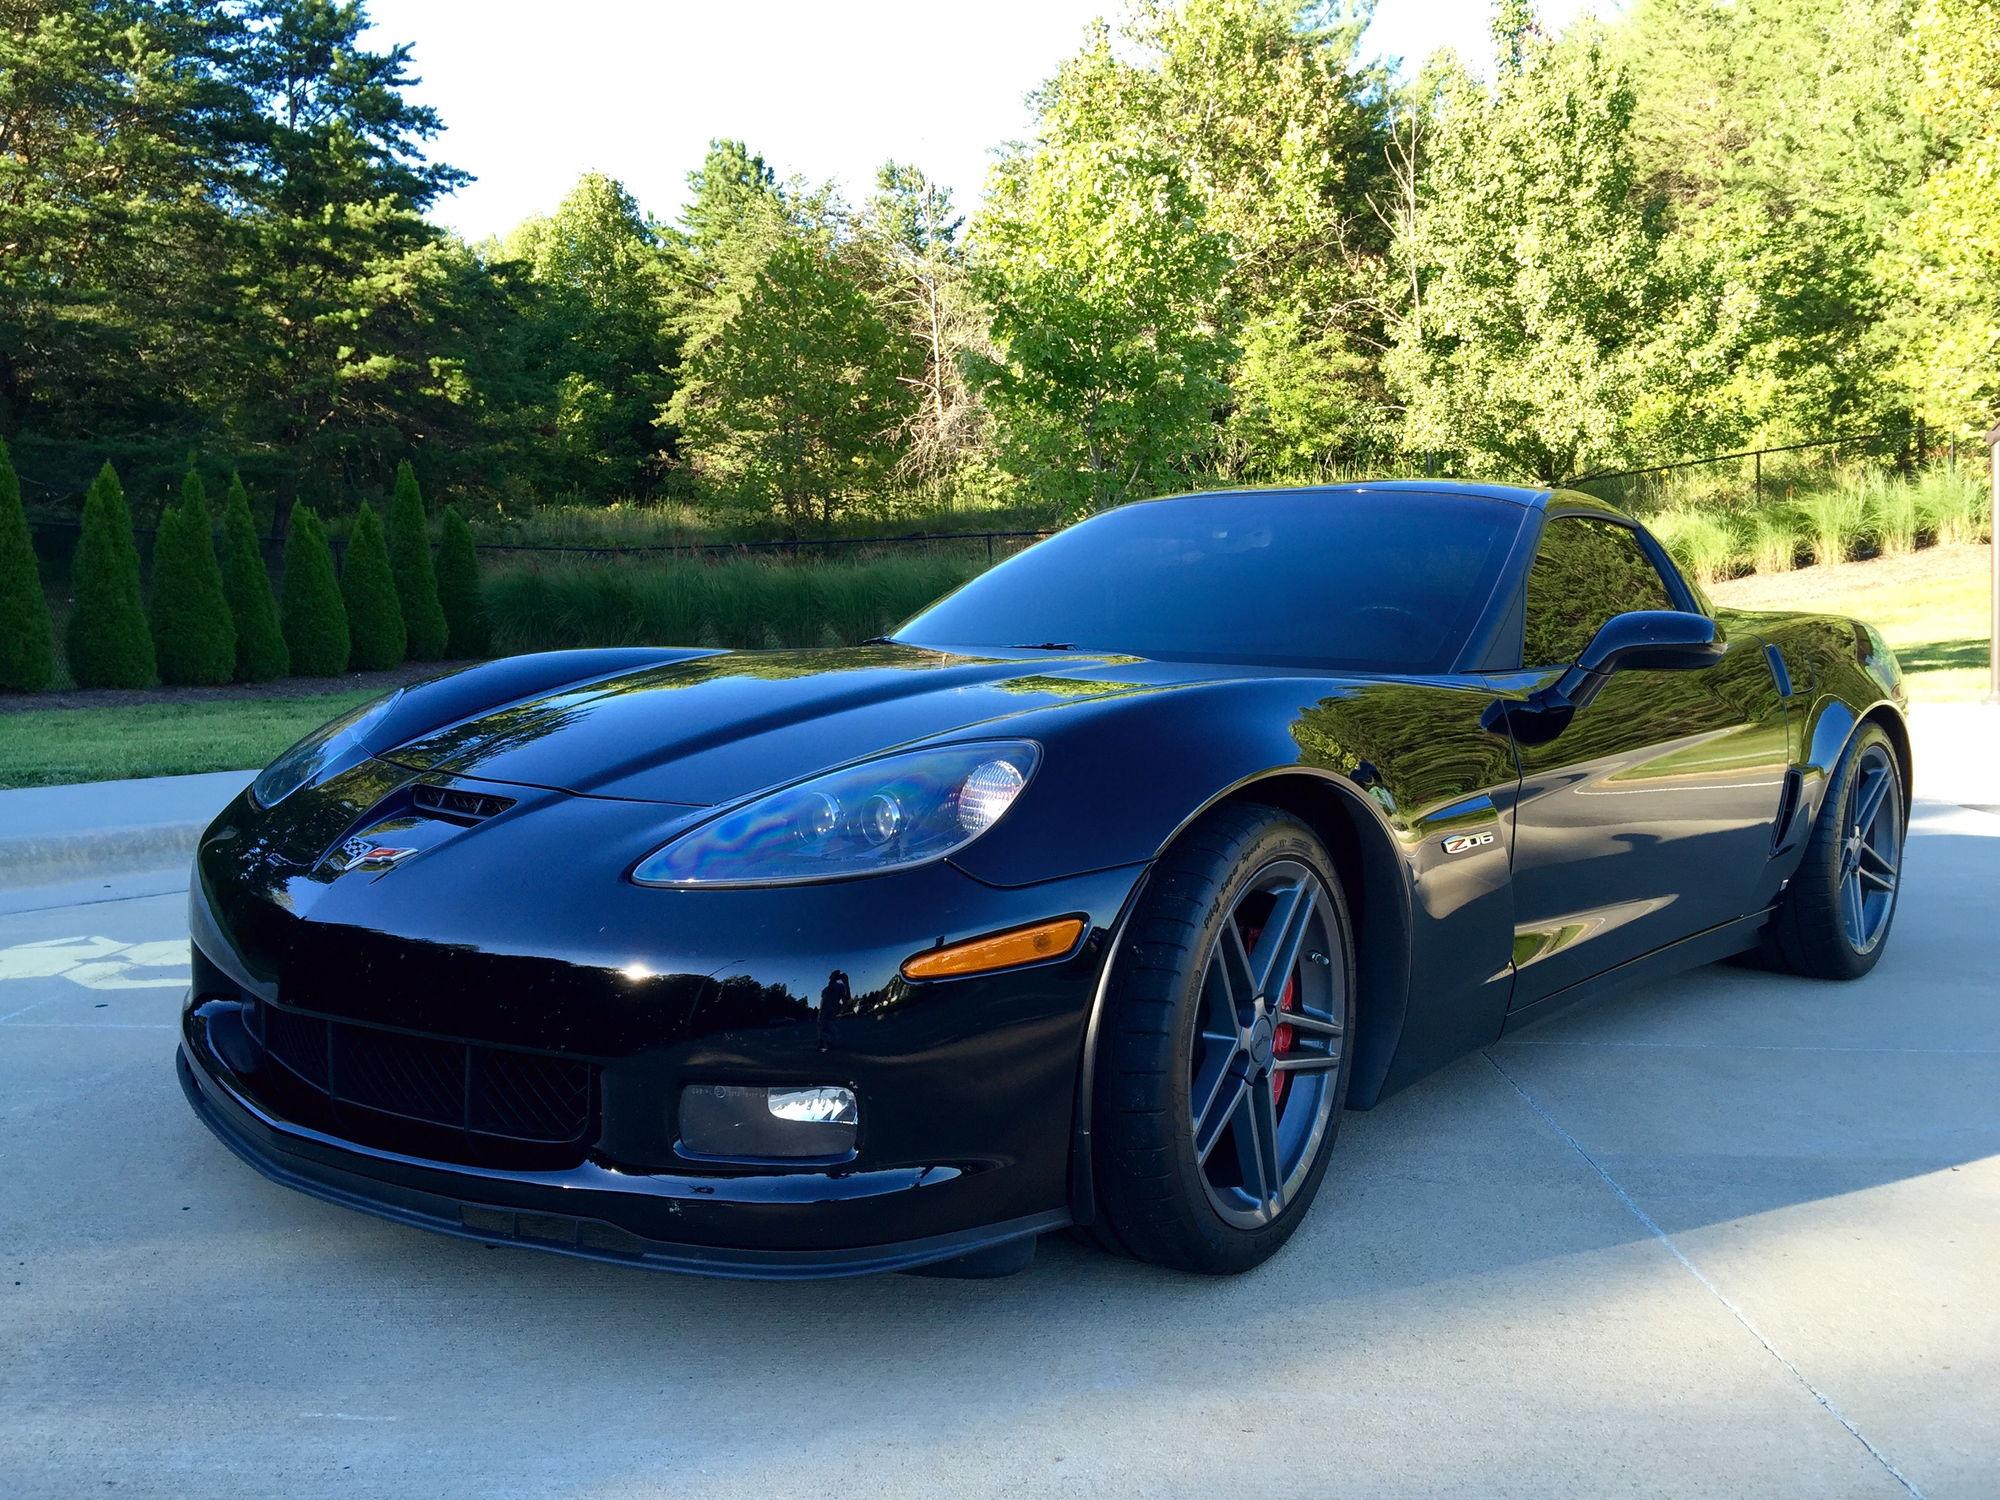 2015 z06 corvettes for sale in autos post. Black Bedroom Furniture Sets. Home Design Ideas